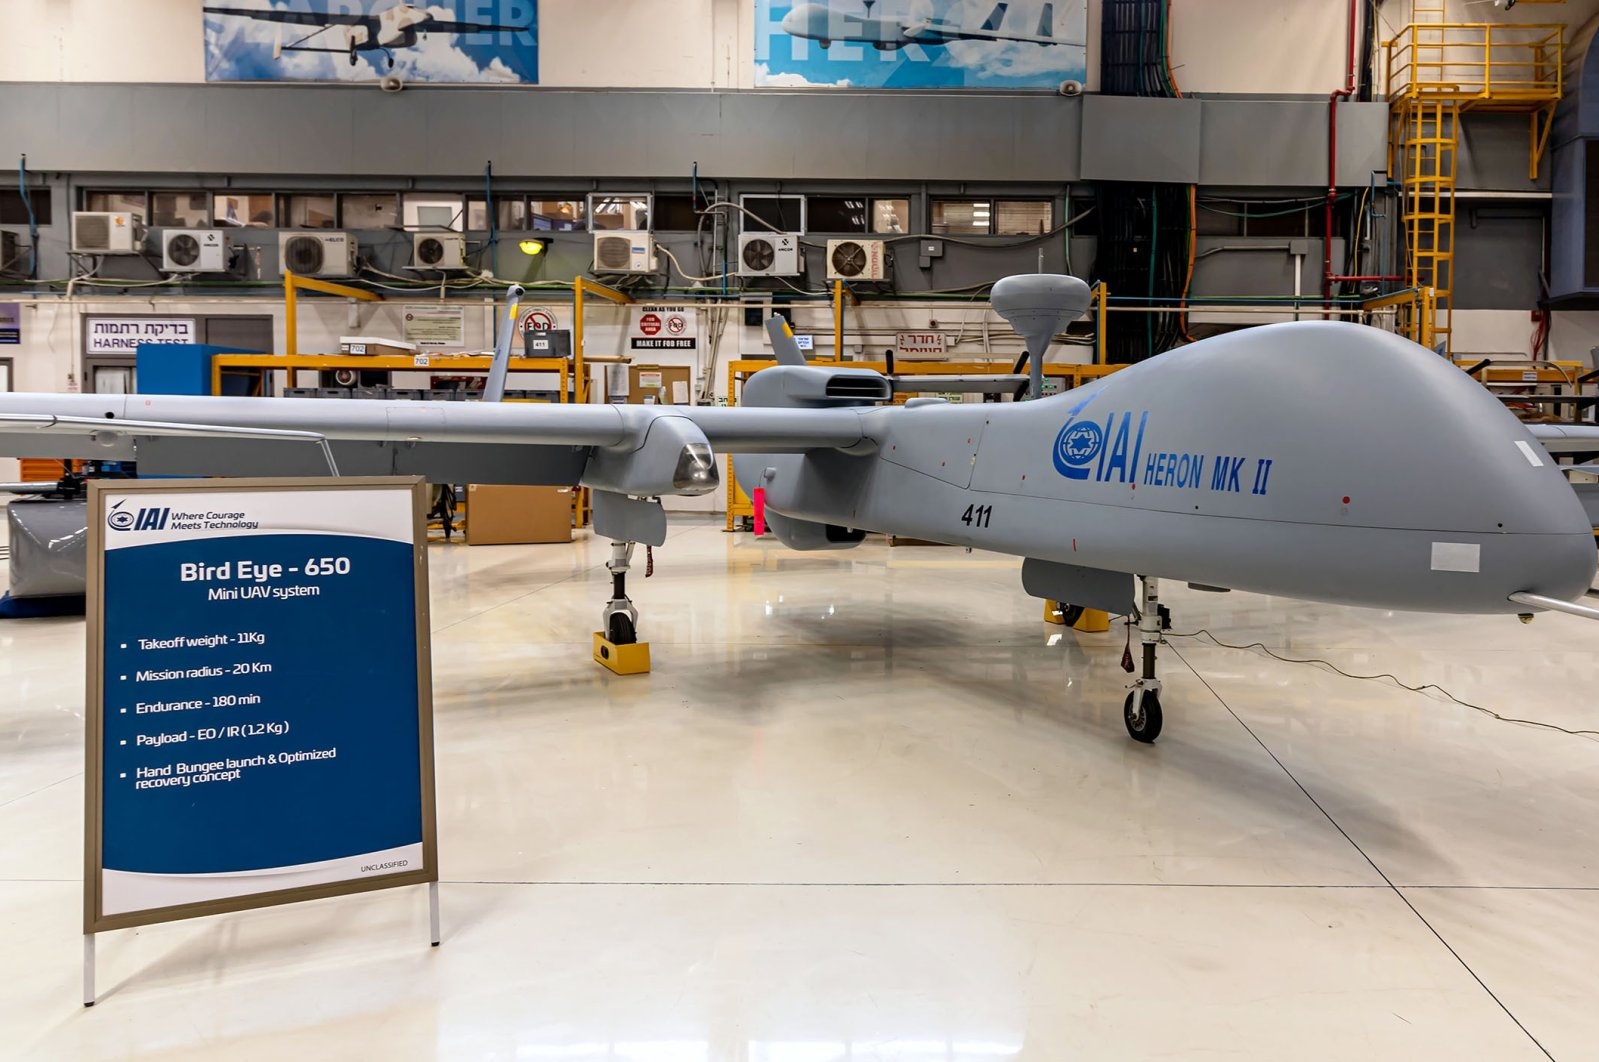 """Heron MK II"" UAV of the Israel Aerospace Industries, Ben Gurion Airport, Israel, May 4, 2021. (Shutterstock Photo)"